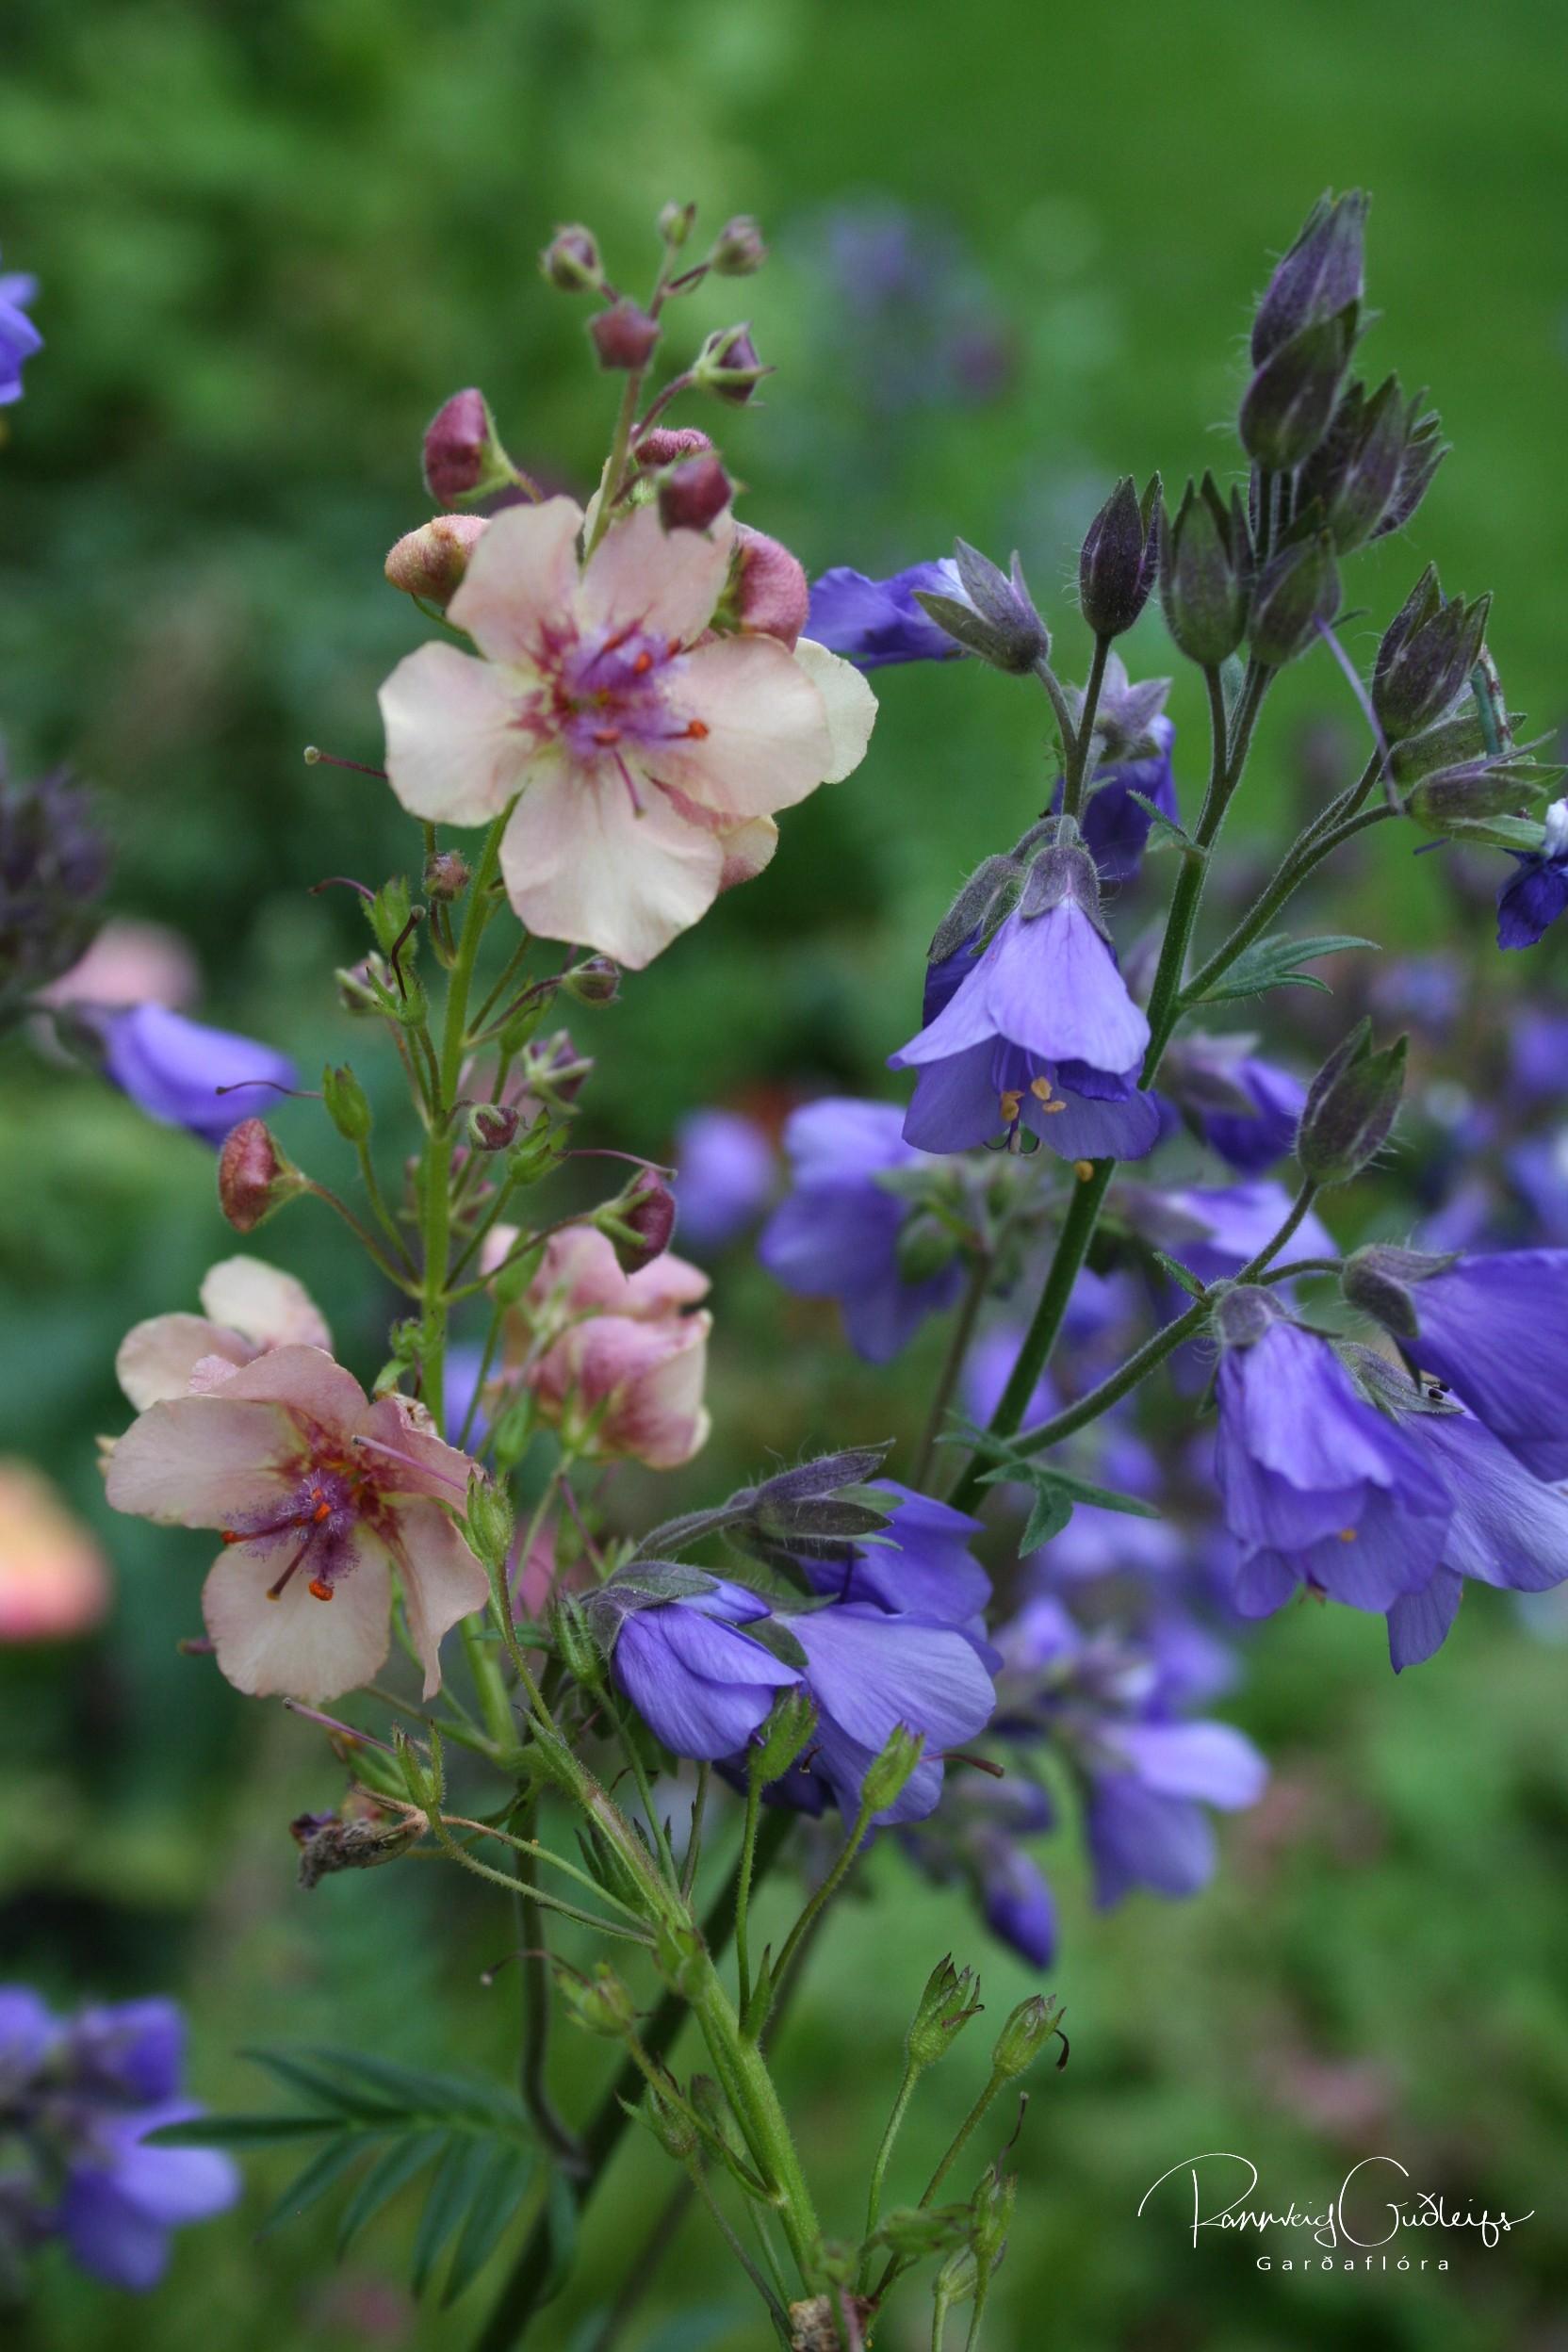 Verbascum x hybridum 'Southern Charm'